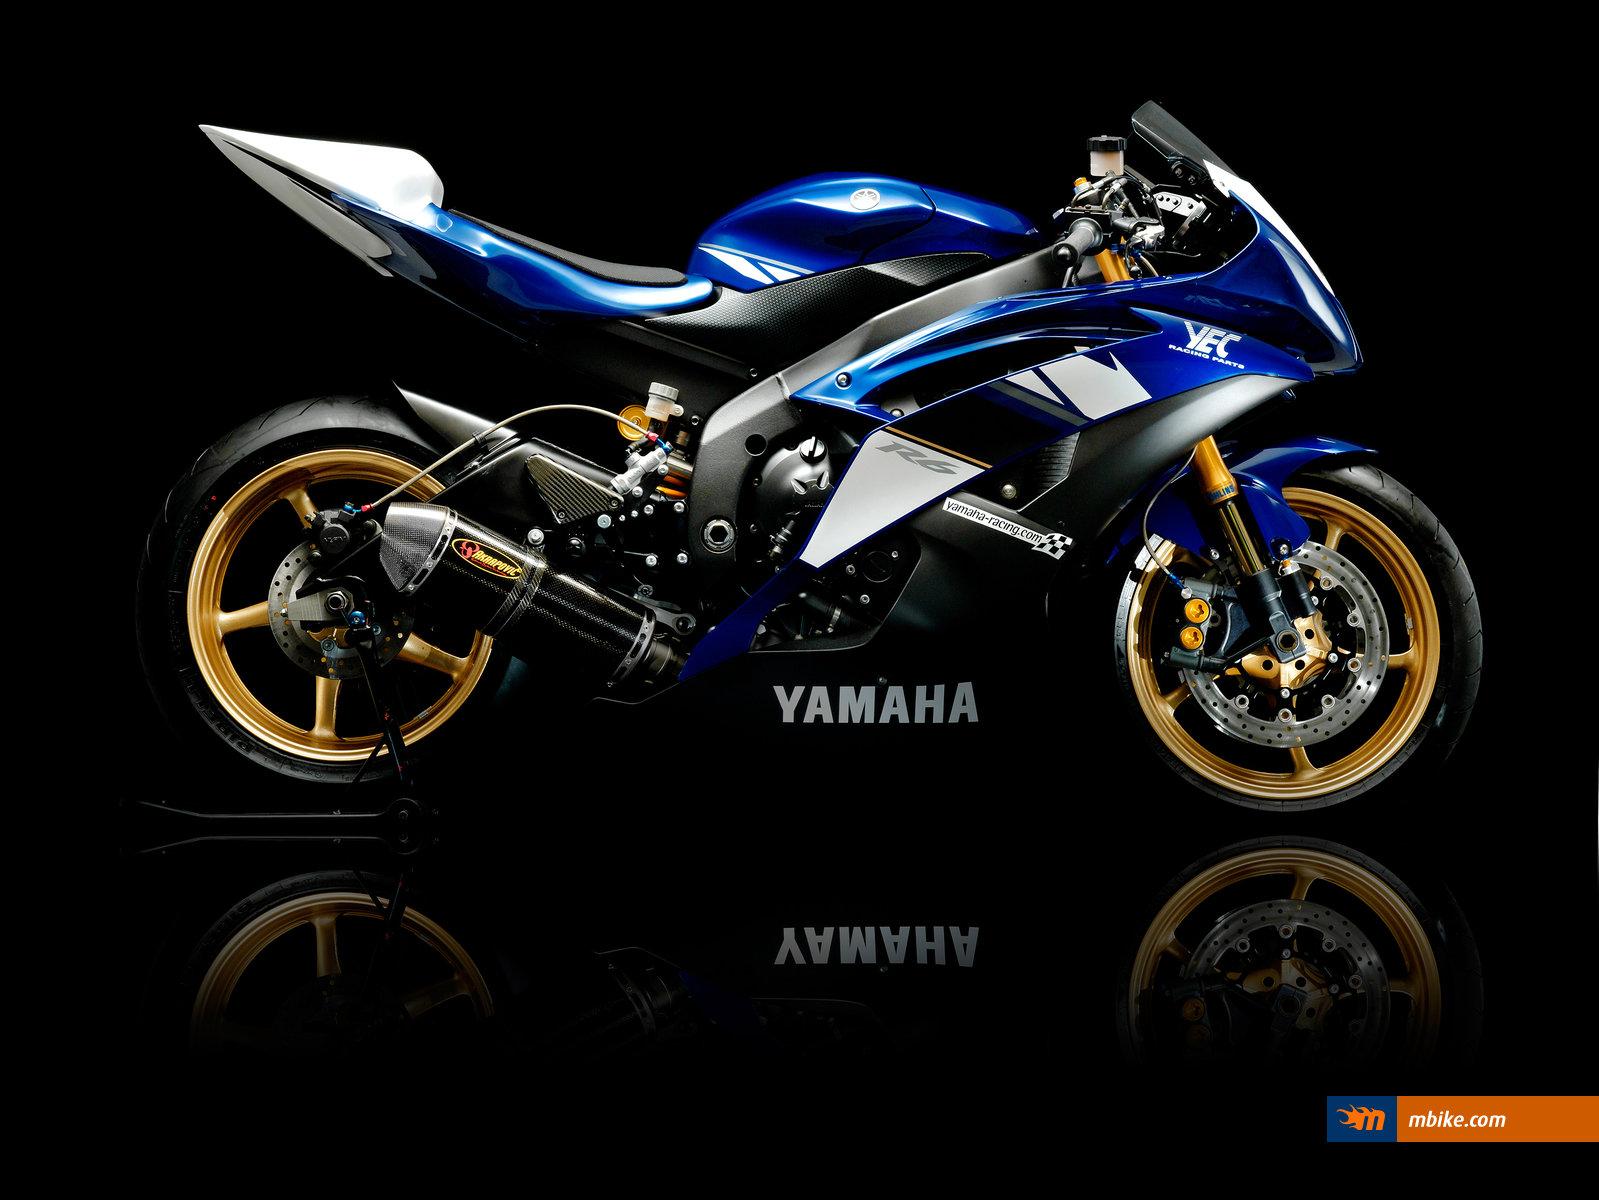 2008 Yamaha YZF R6 Wallpaper   Mbikecom 1599x1200